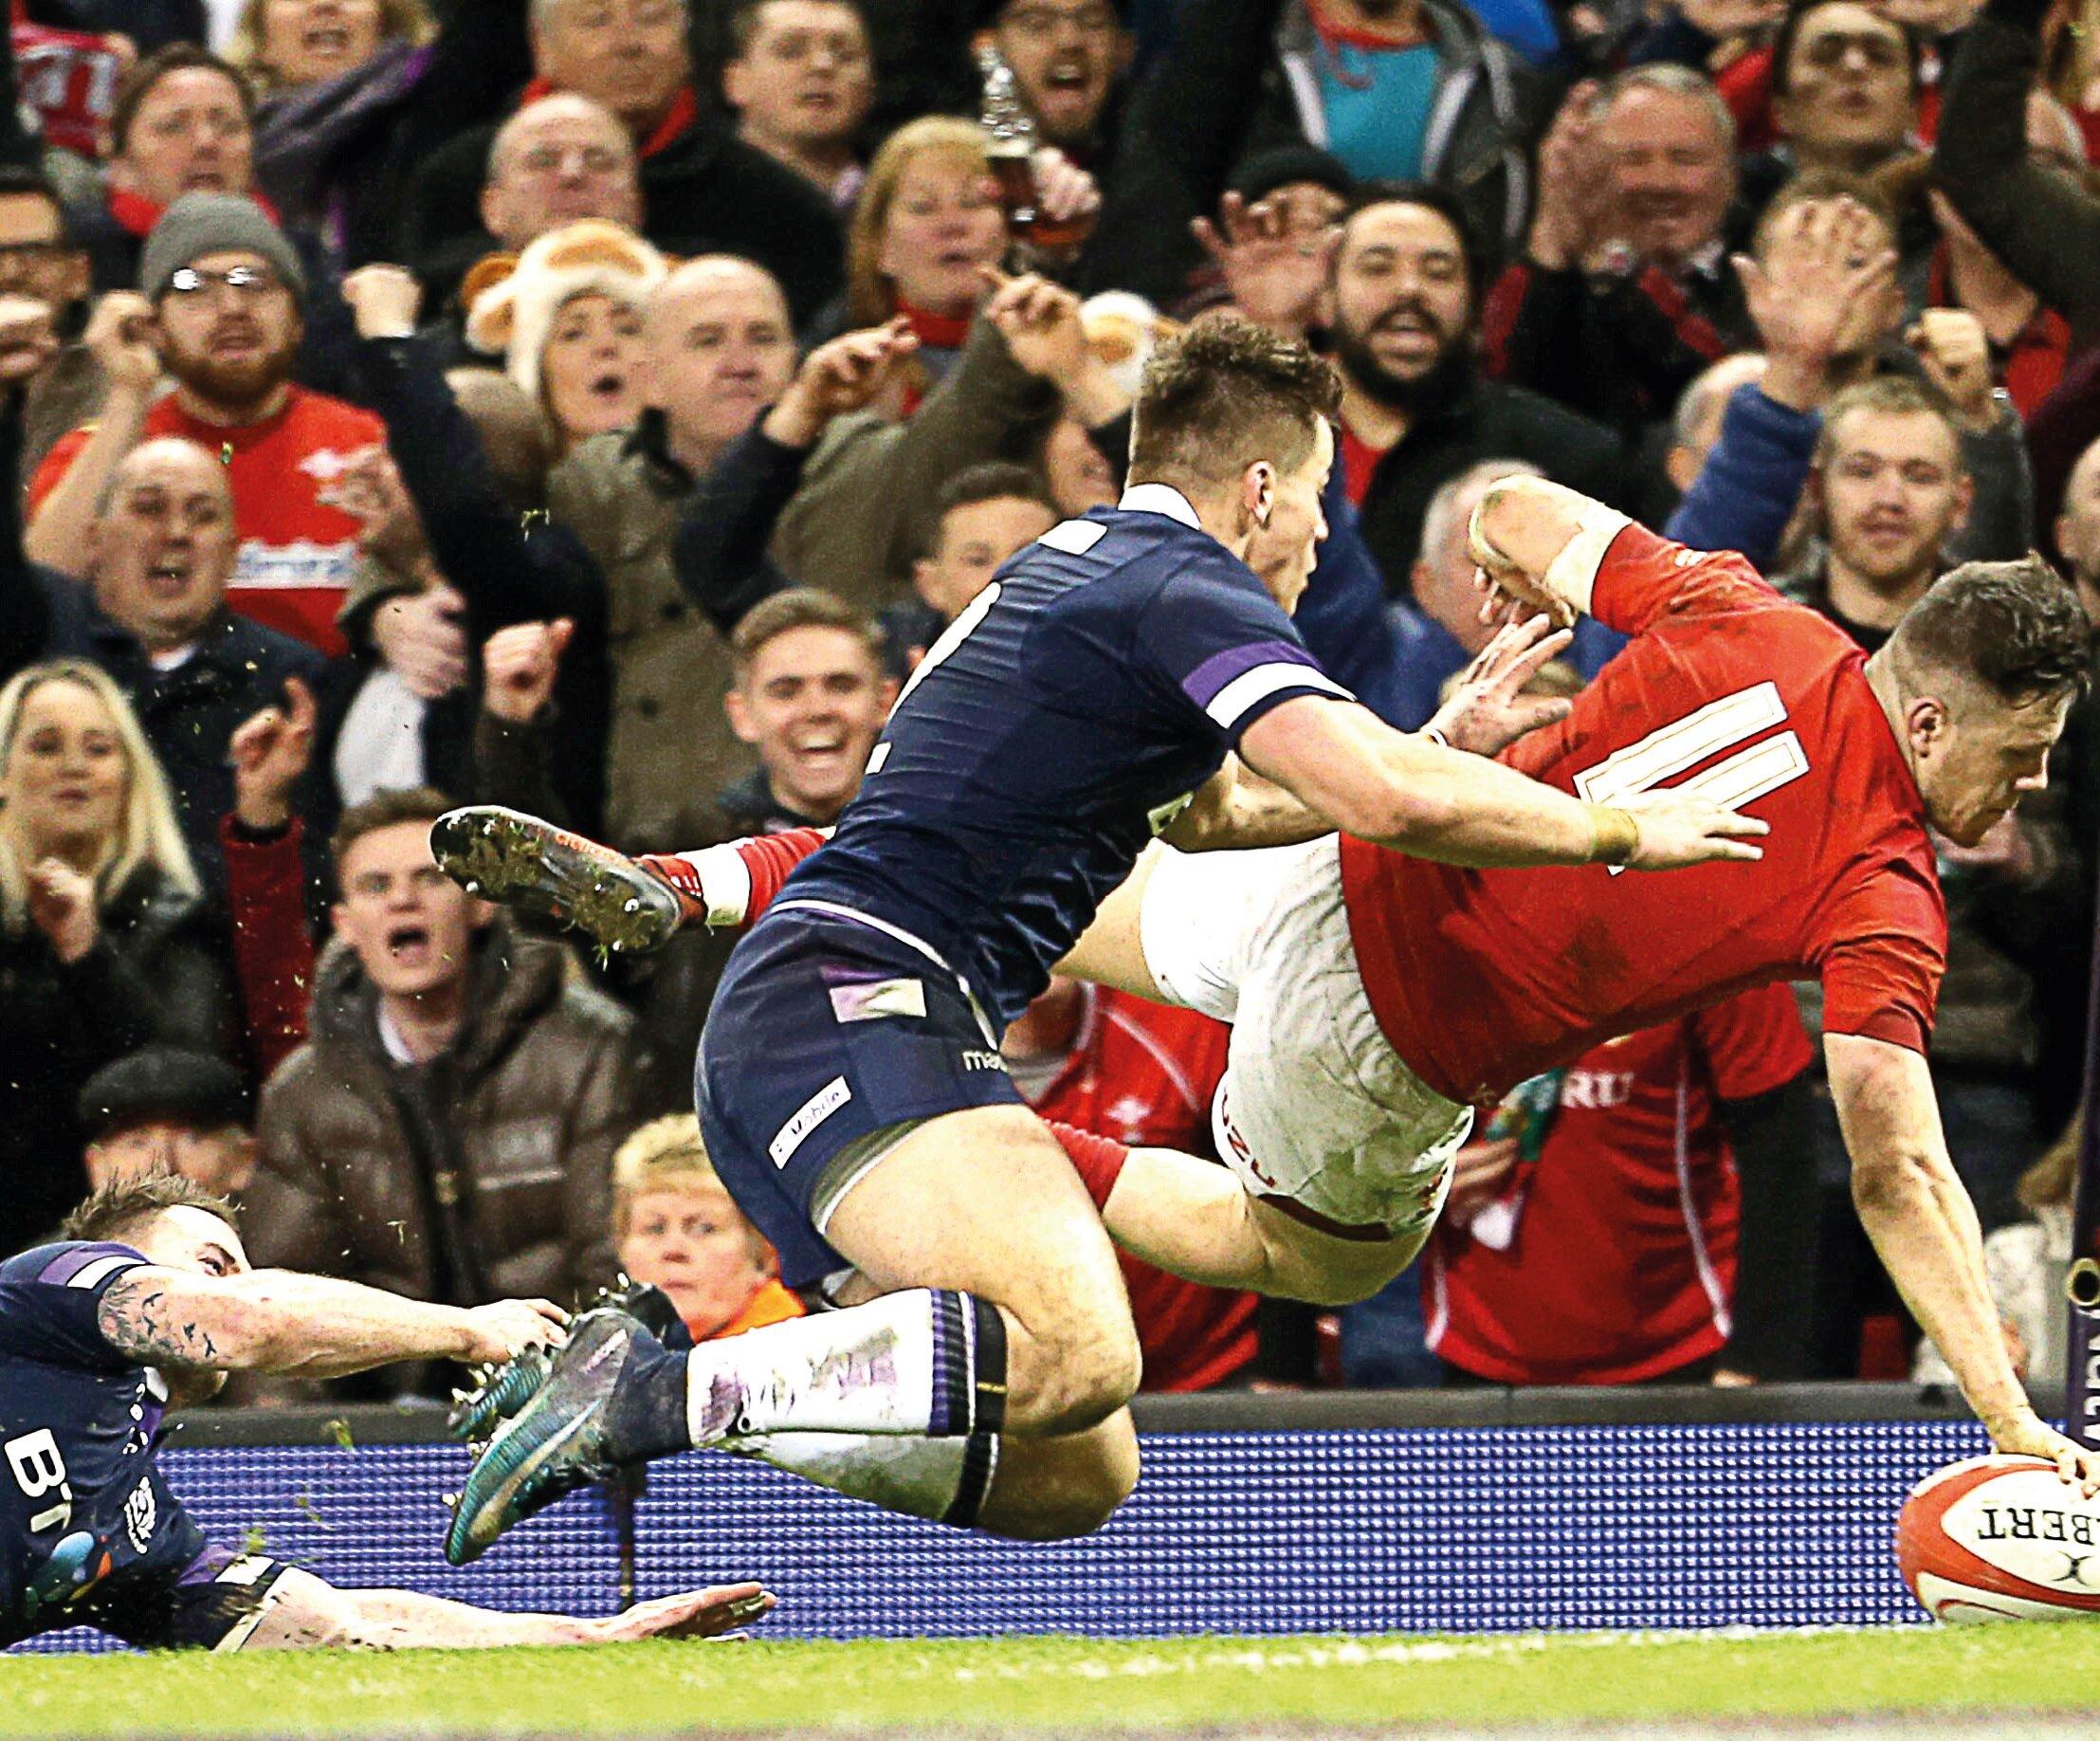 Wales vs Scotland - Guinness Six Nations 2020 - Principality Stadium, CardiffSaturday 14th March 2020